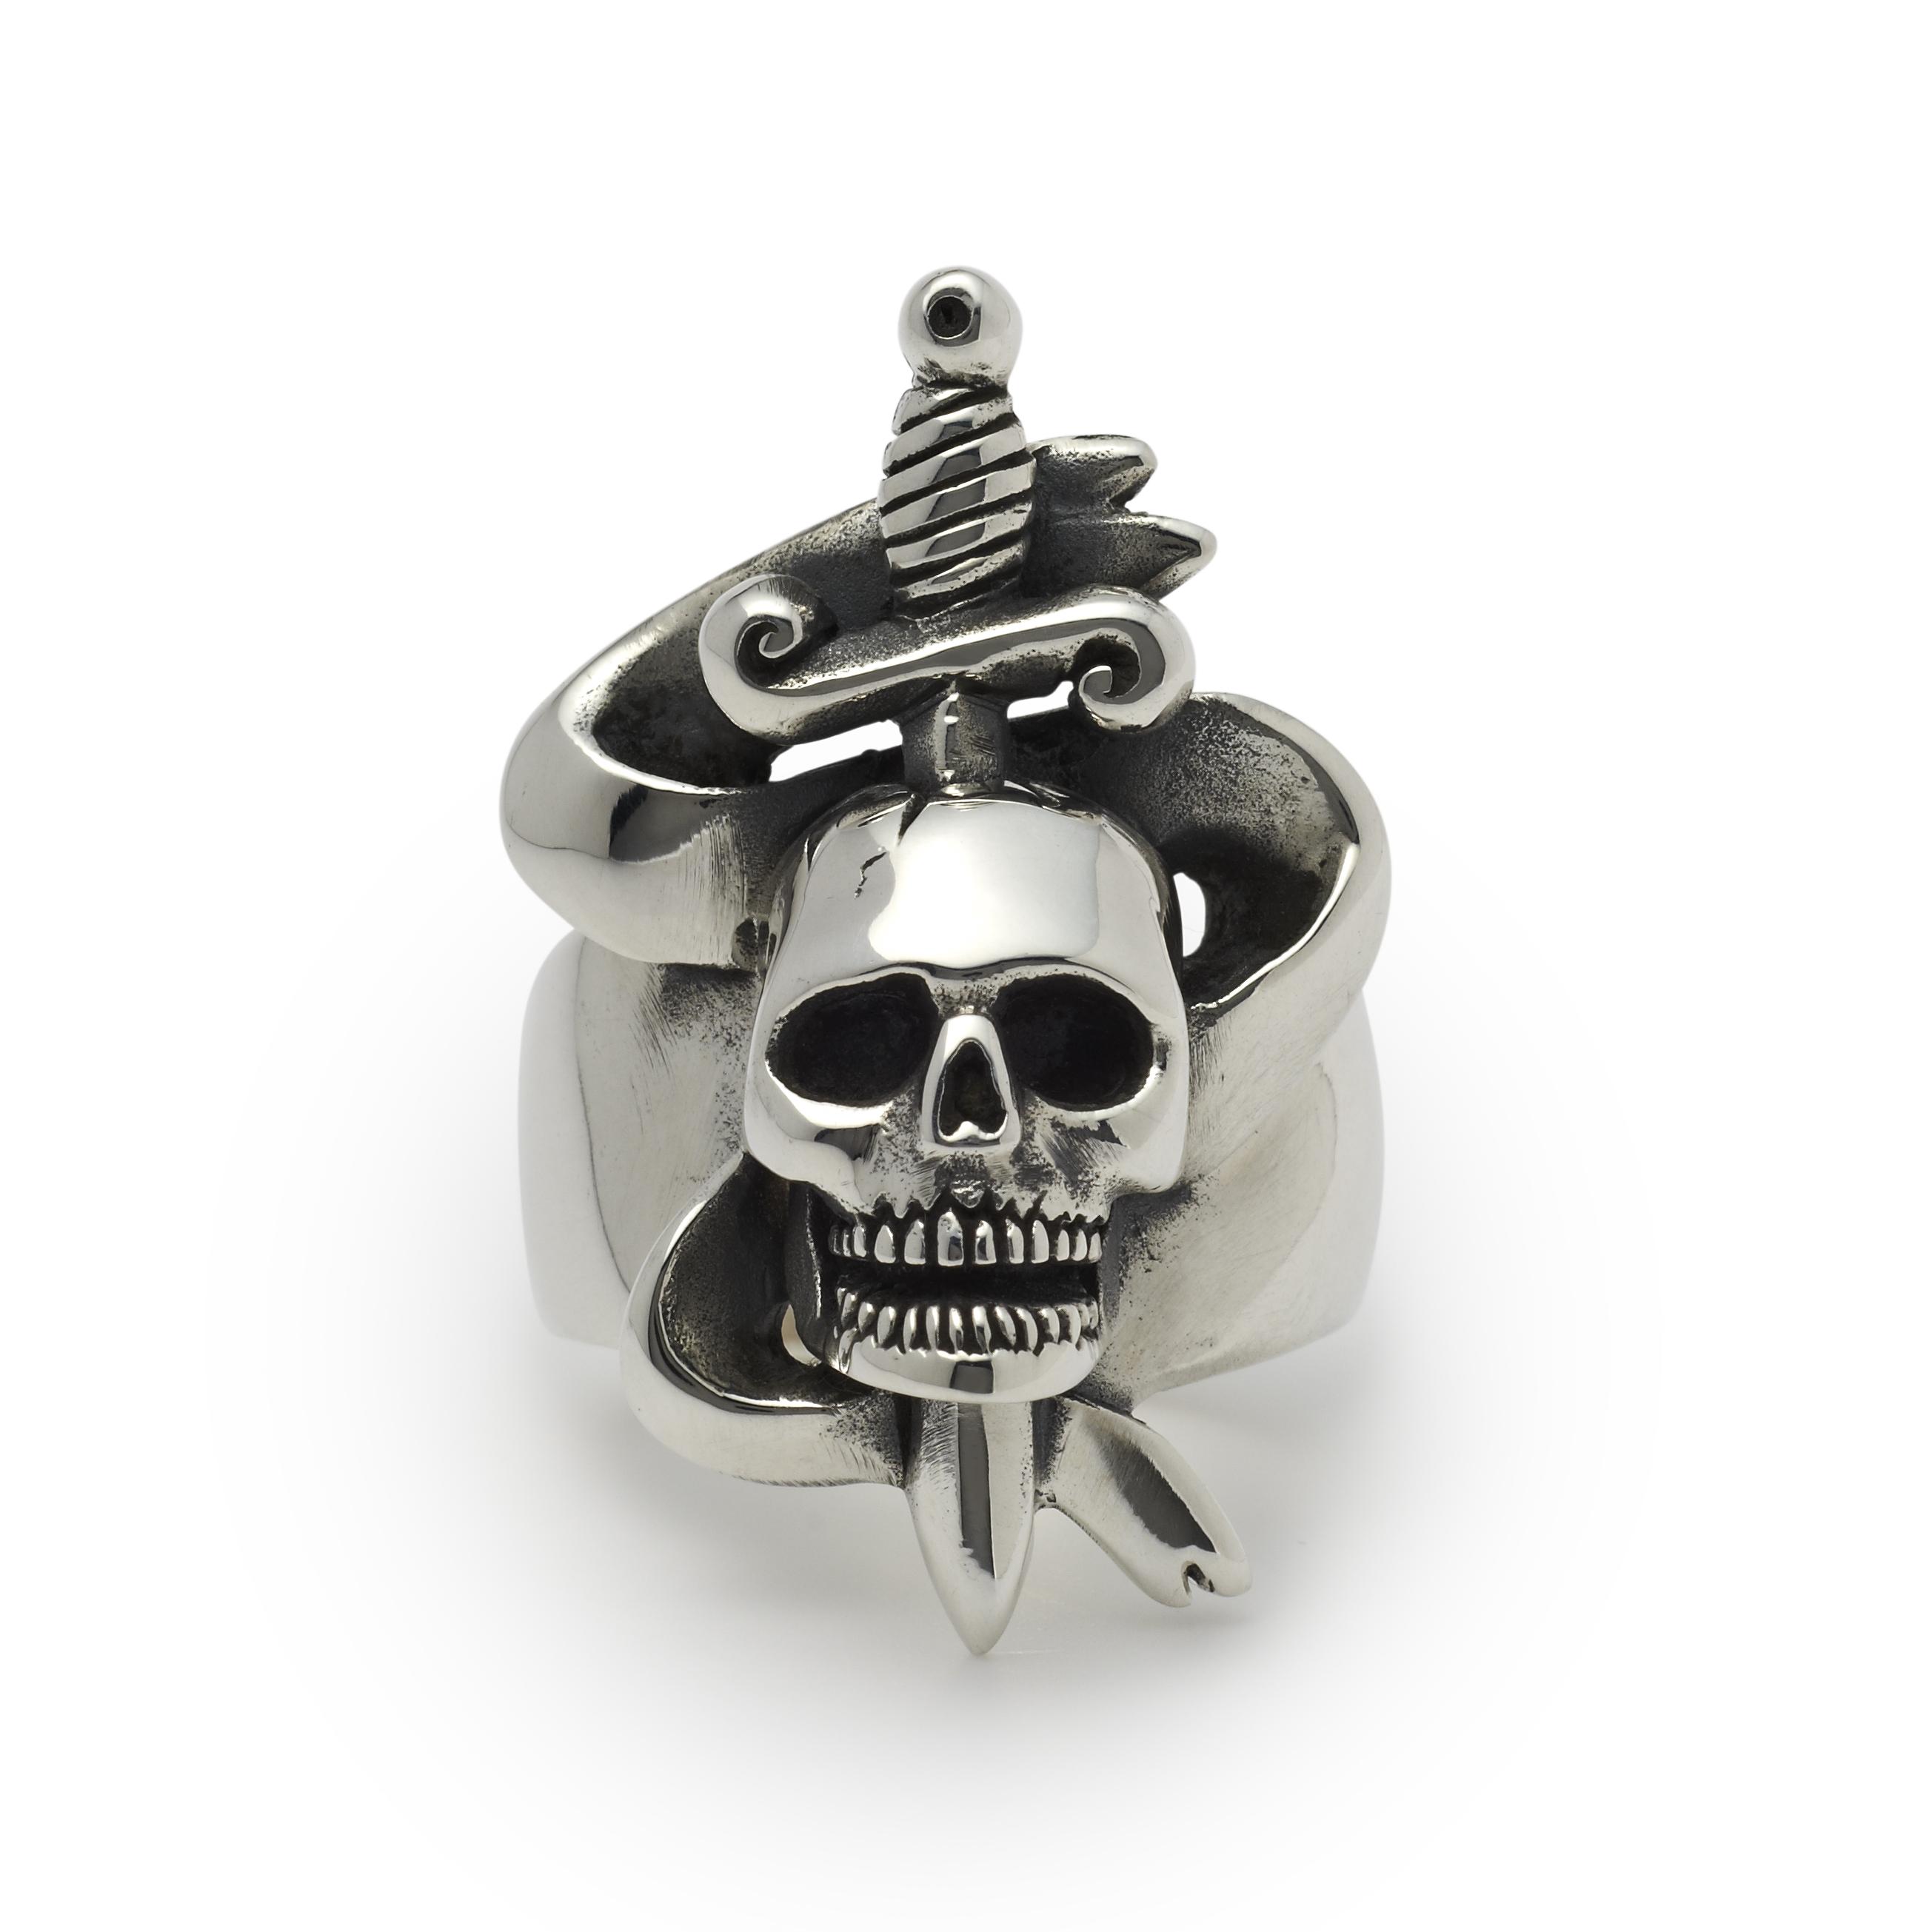 NEW: Skull and Dagger Ring